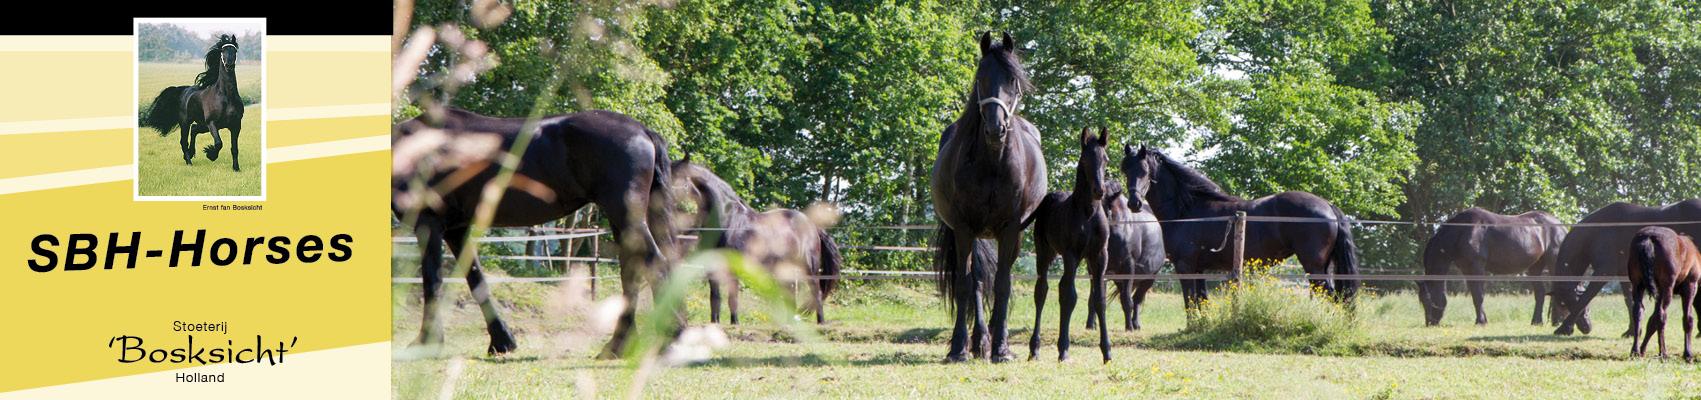 sbhhorses-frisianhorses-slidera4